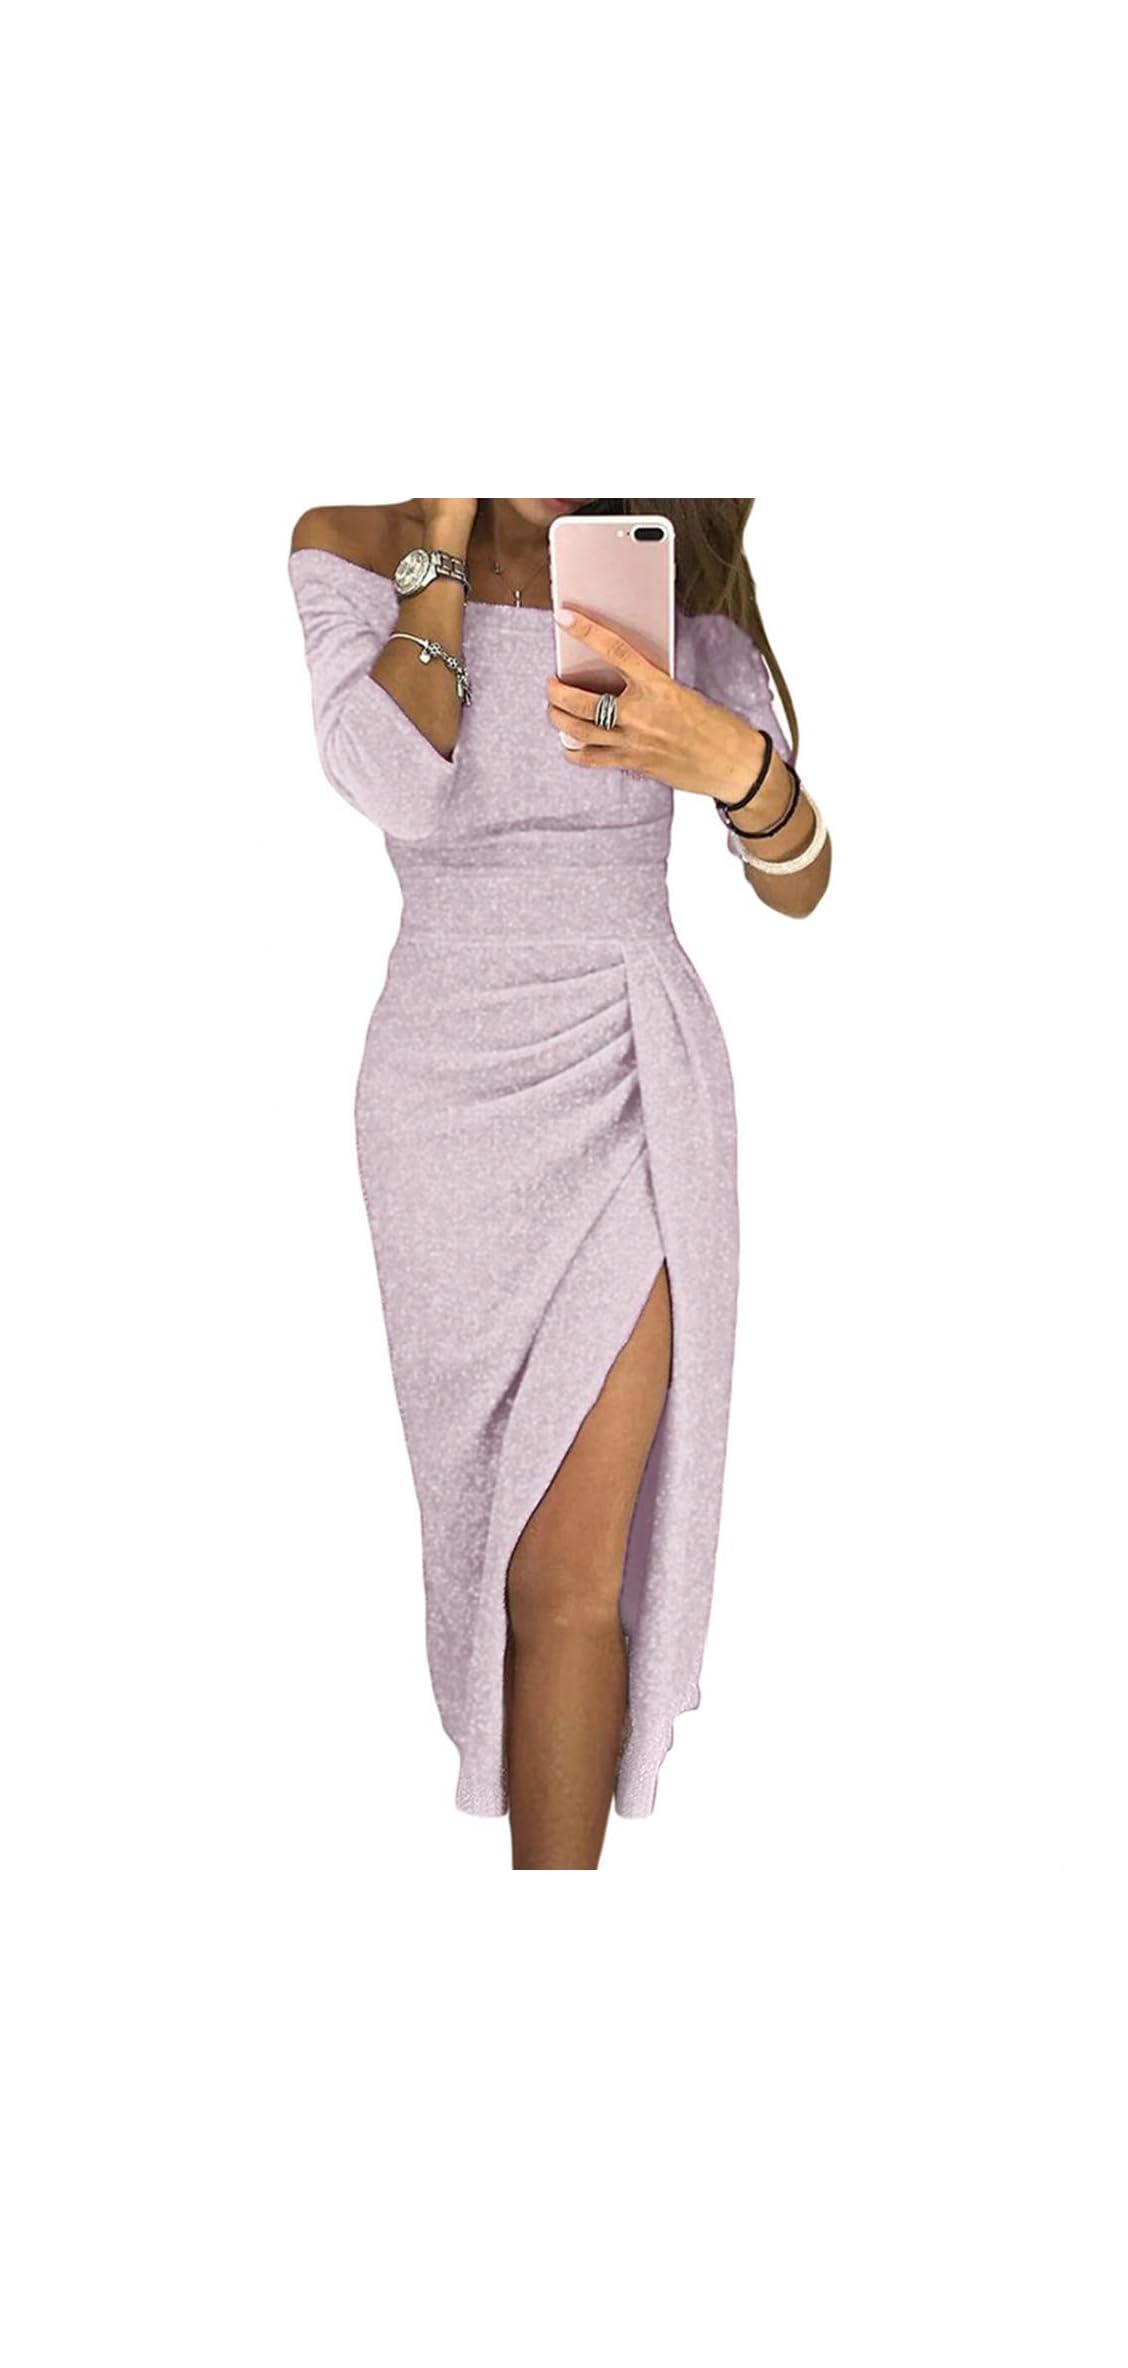 Evening Dresses For Women Formal Off Shoulder Prom Patry